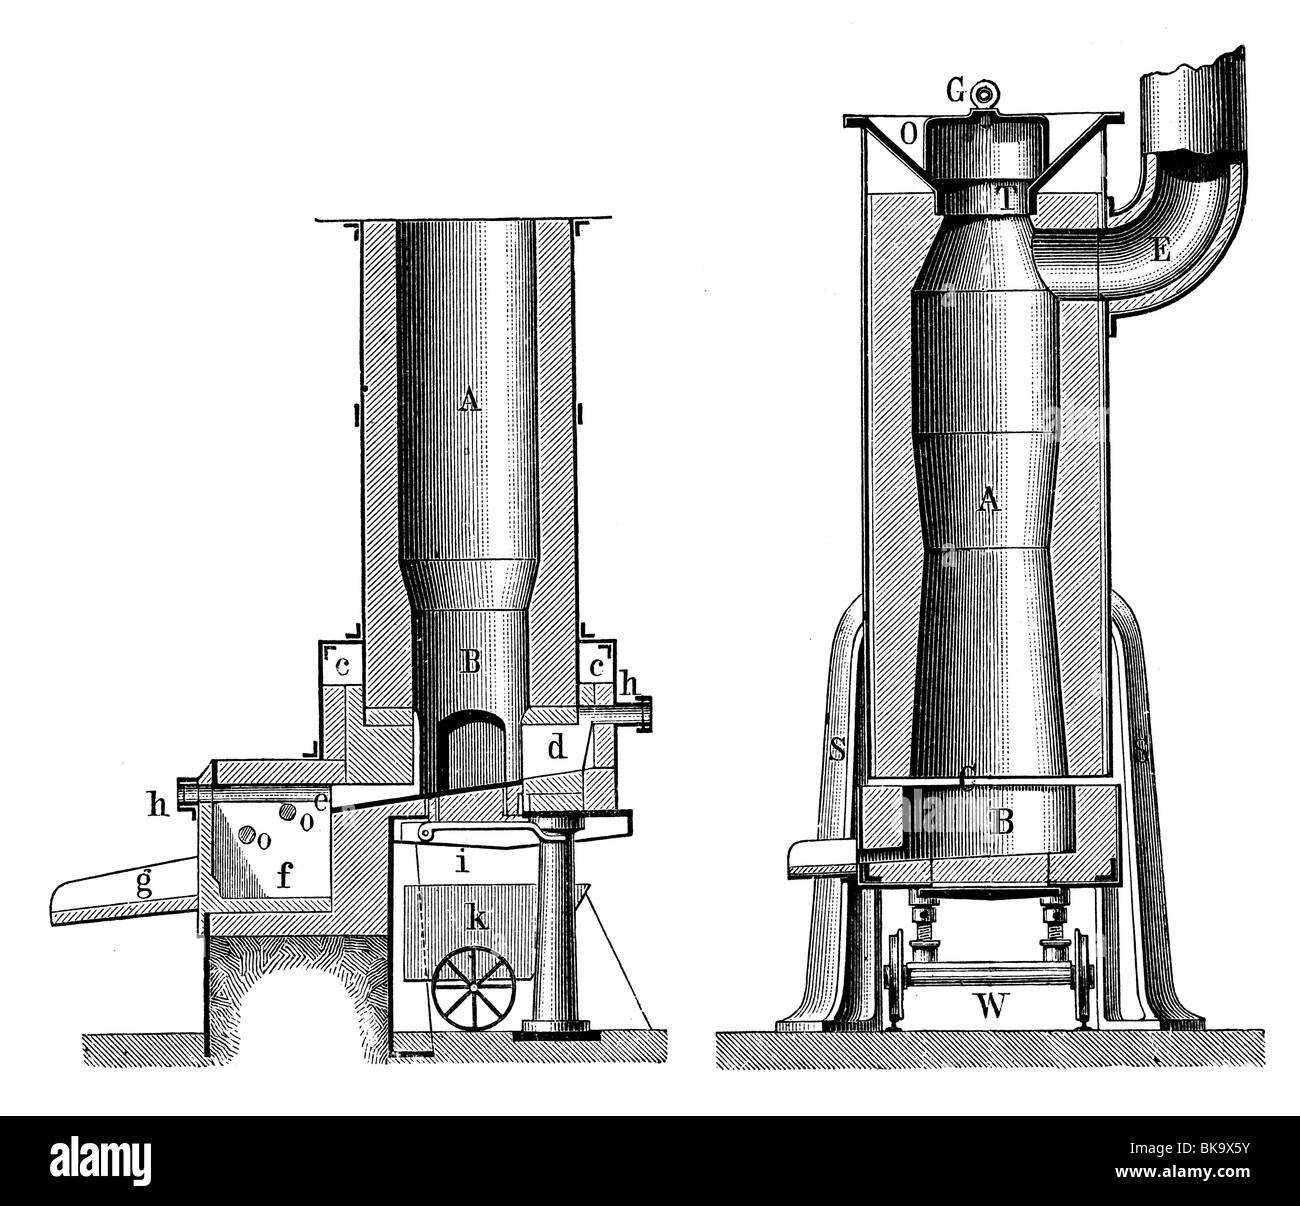 Cupola furnace 2 - Stock Image